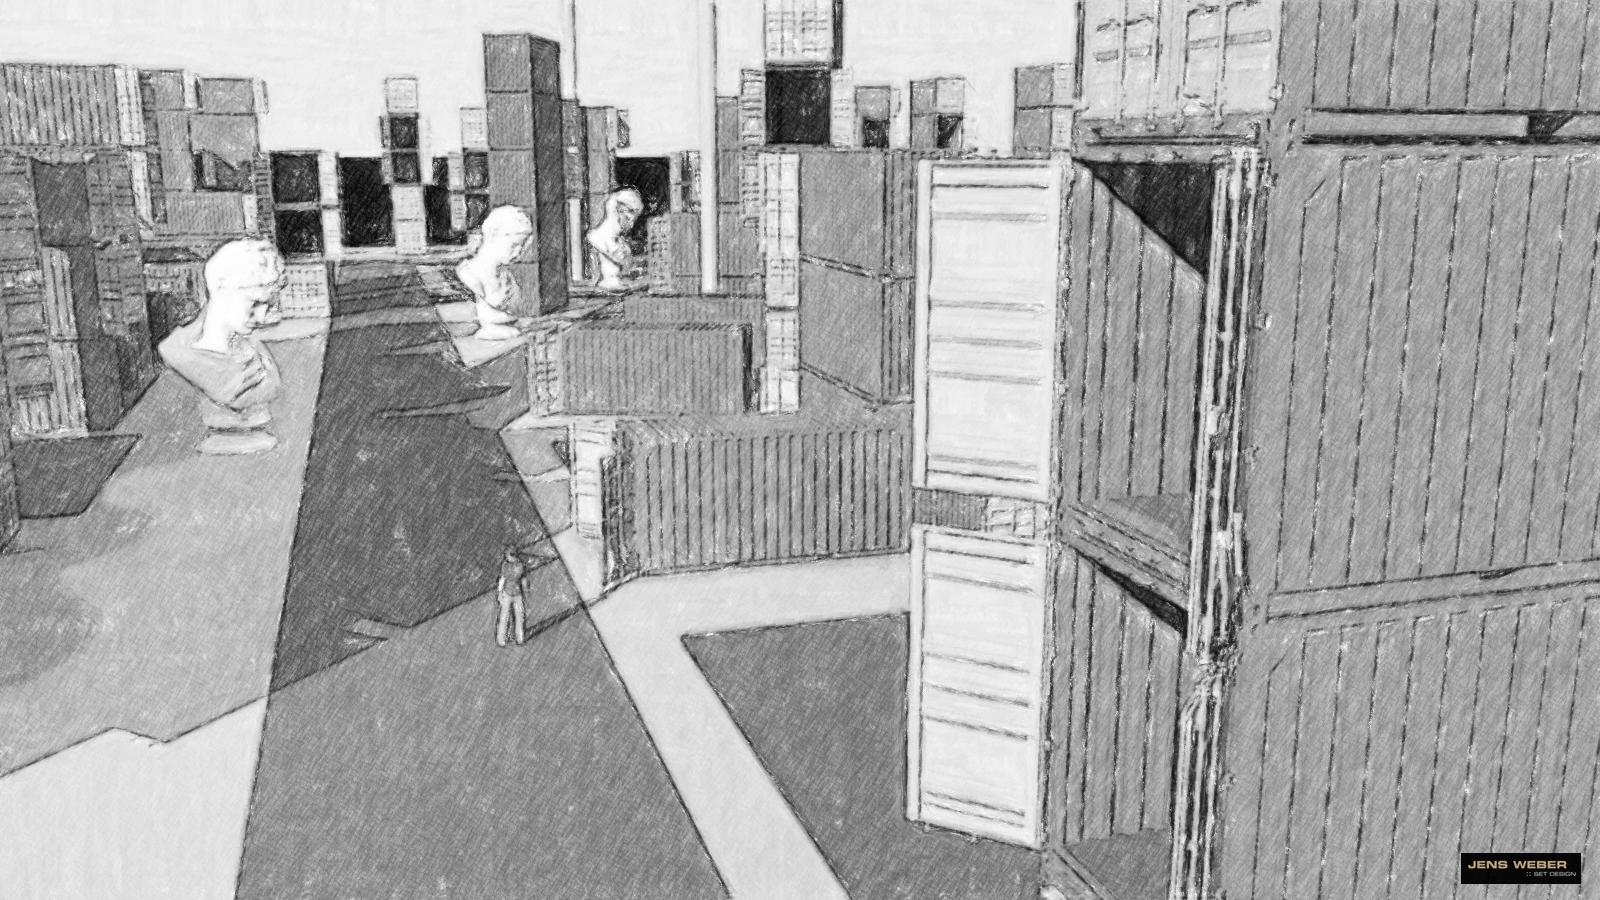 Messe wird Containerstadt